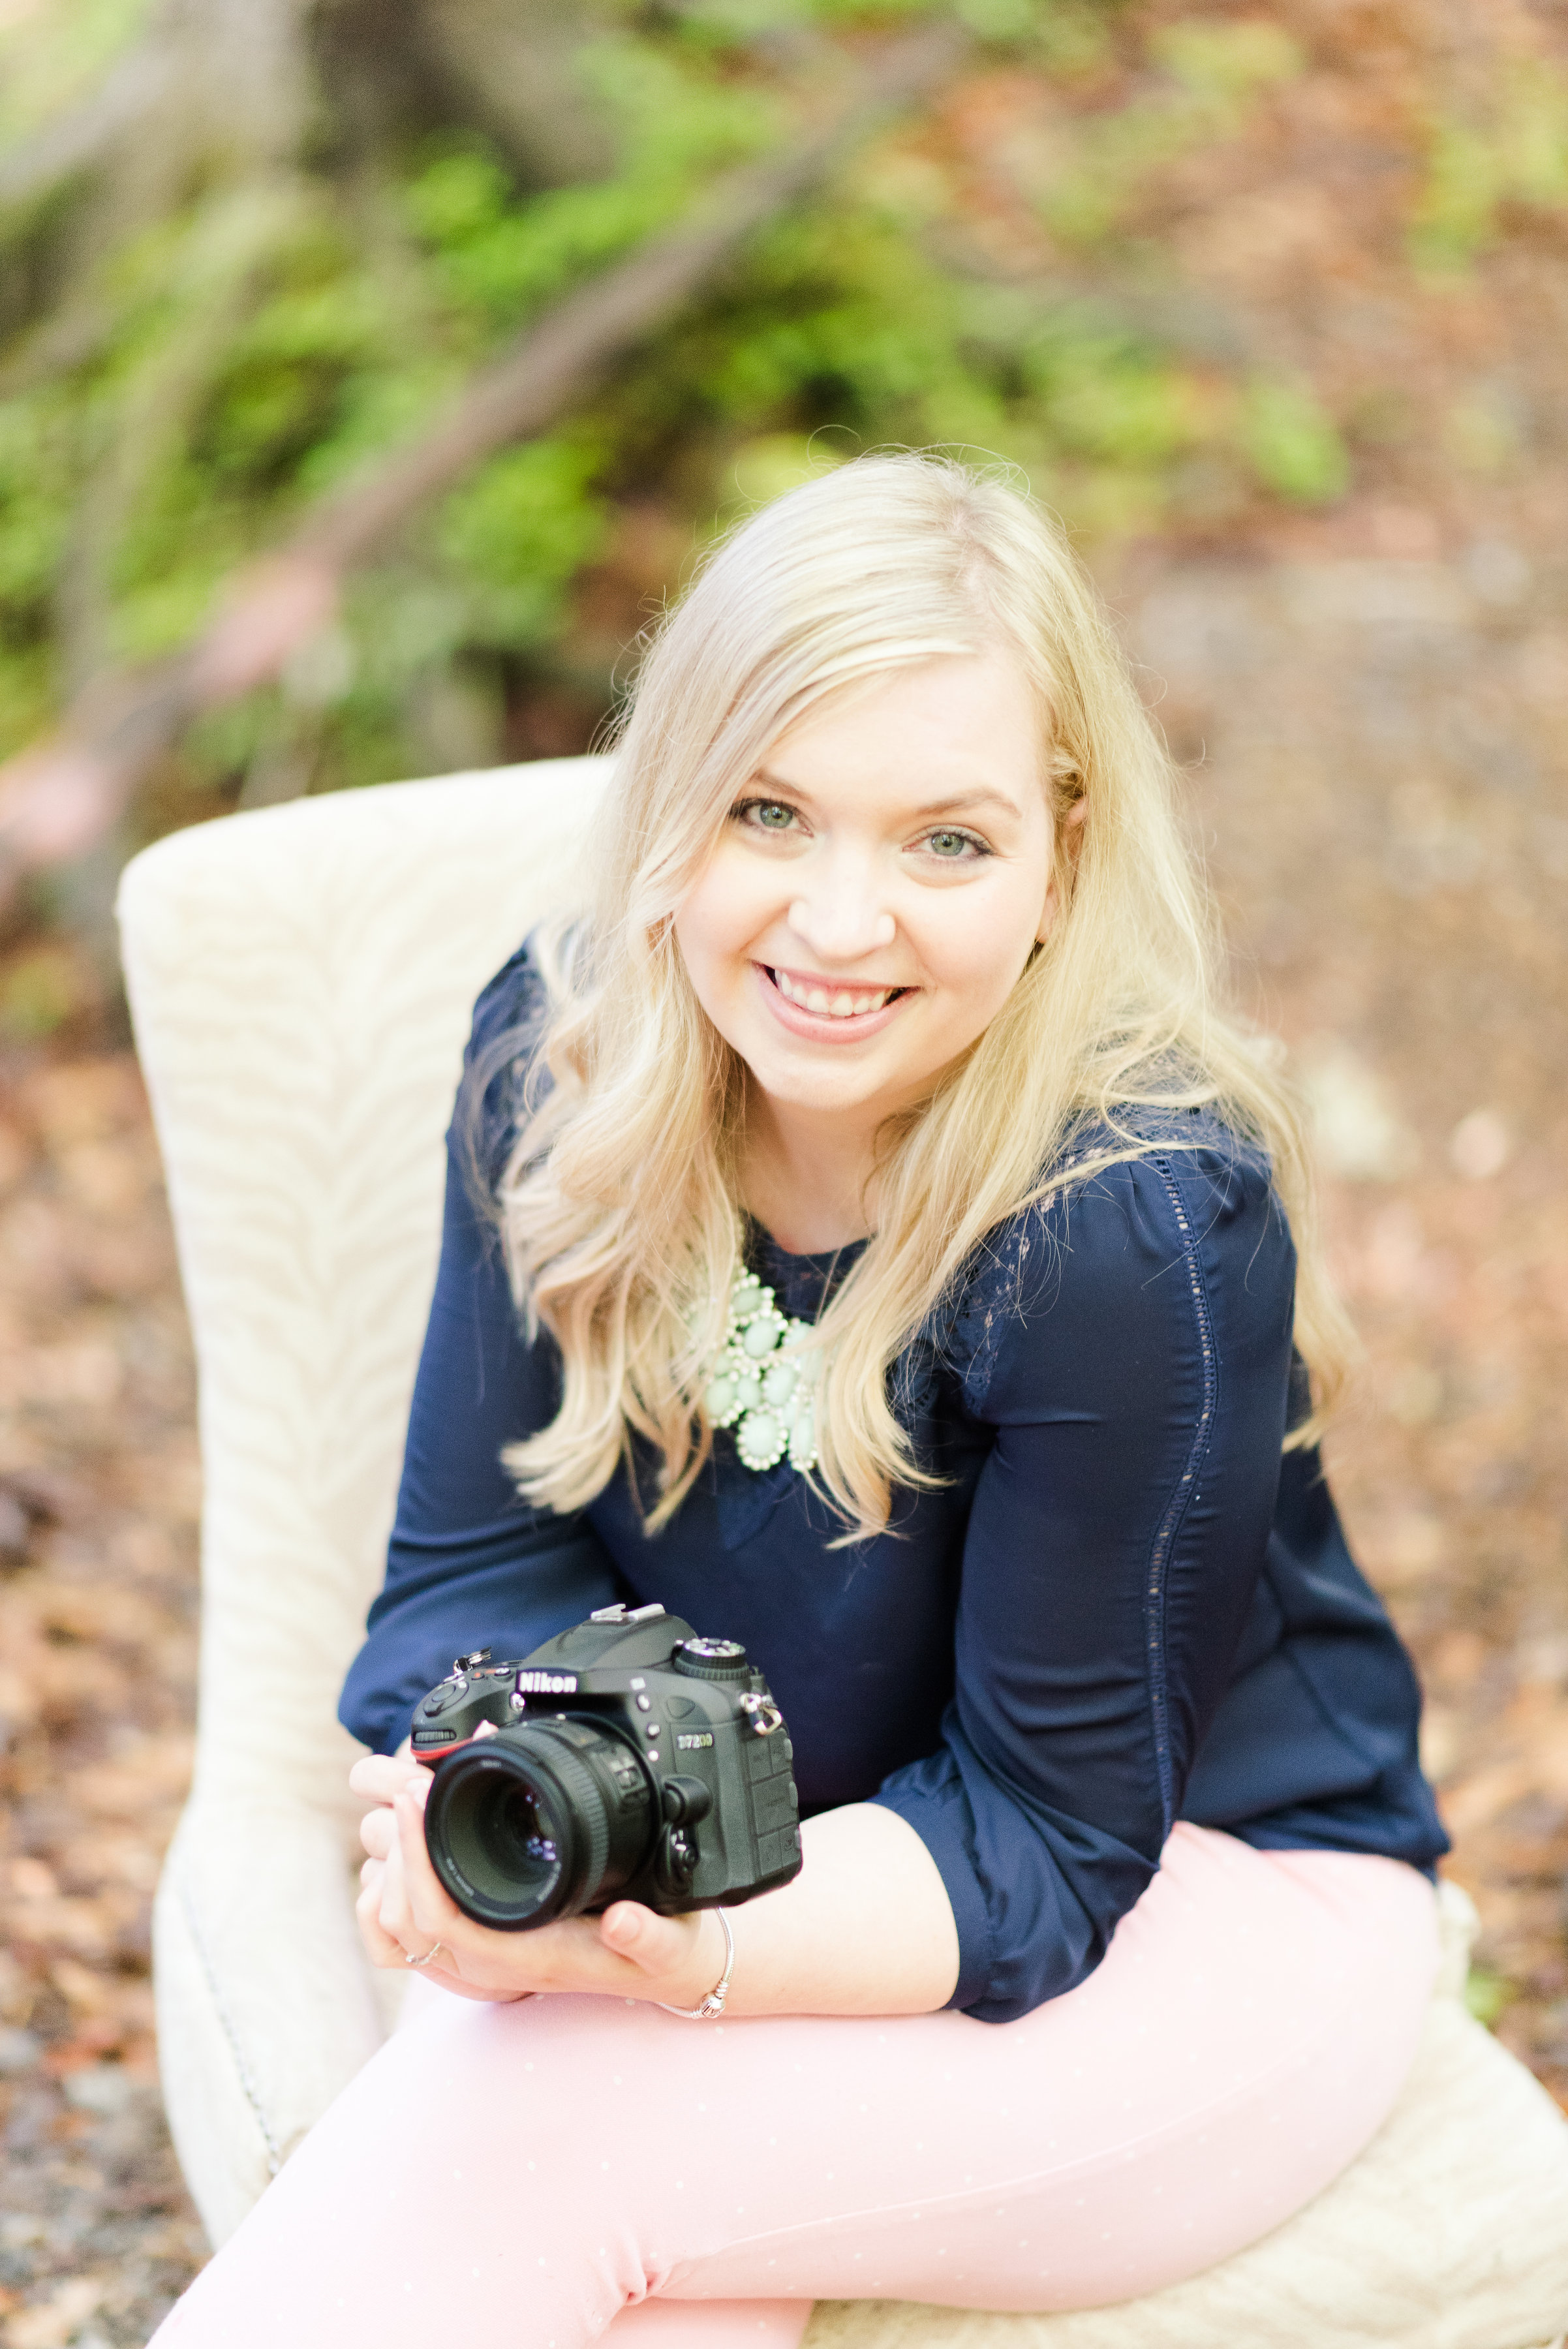 Beaufort wedding photographer -Kaitlin Beckwith